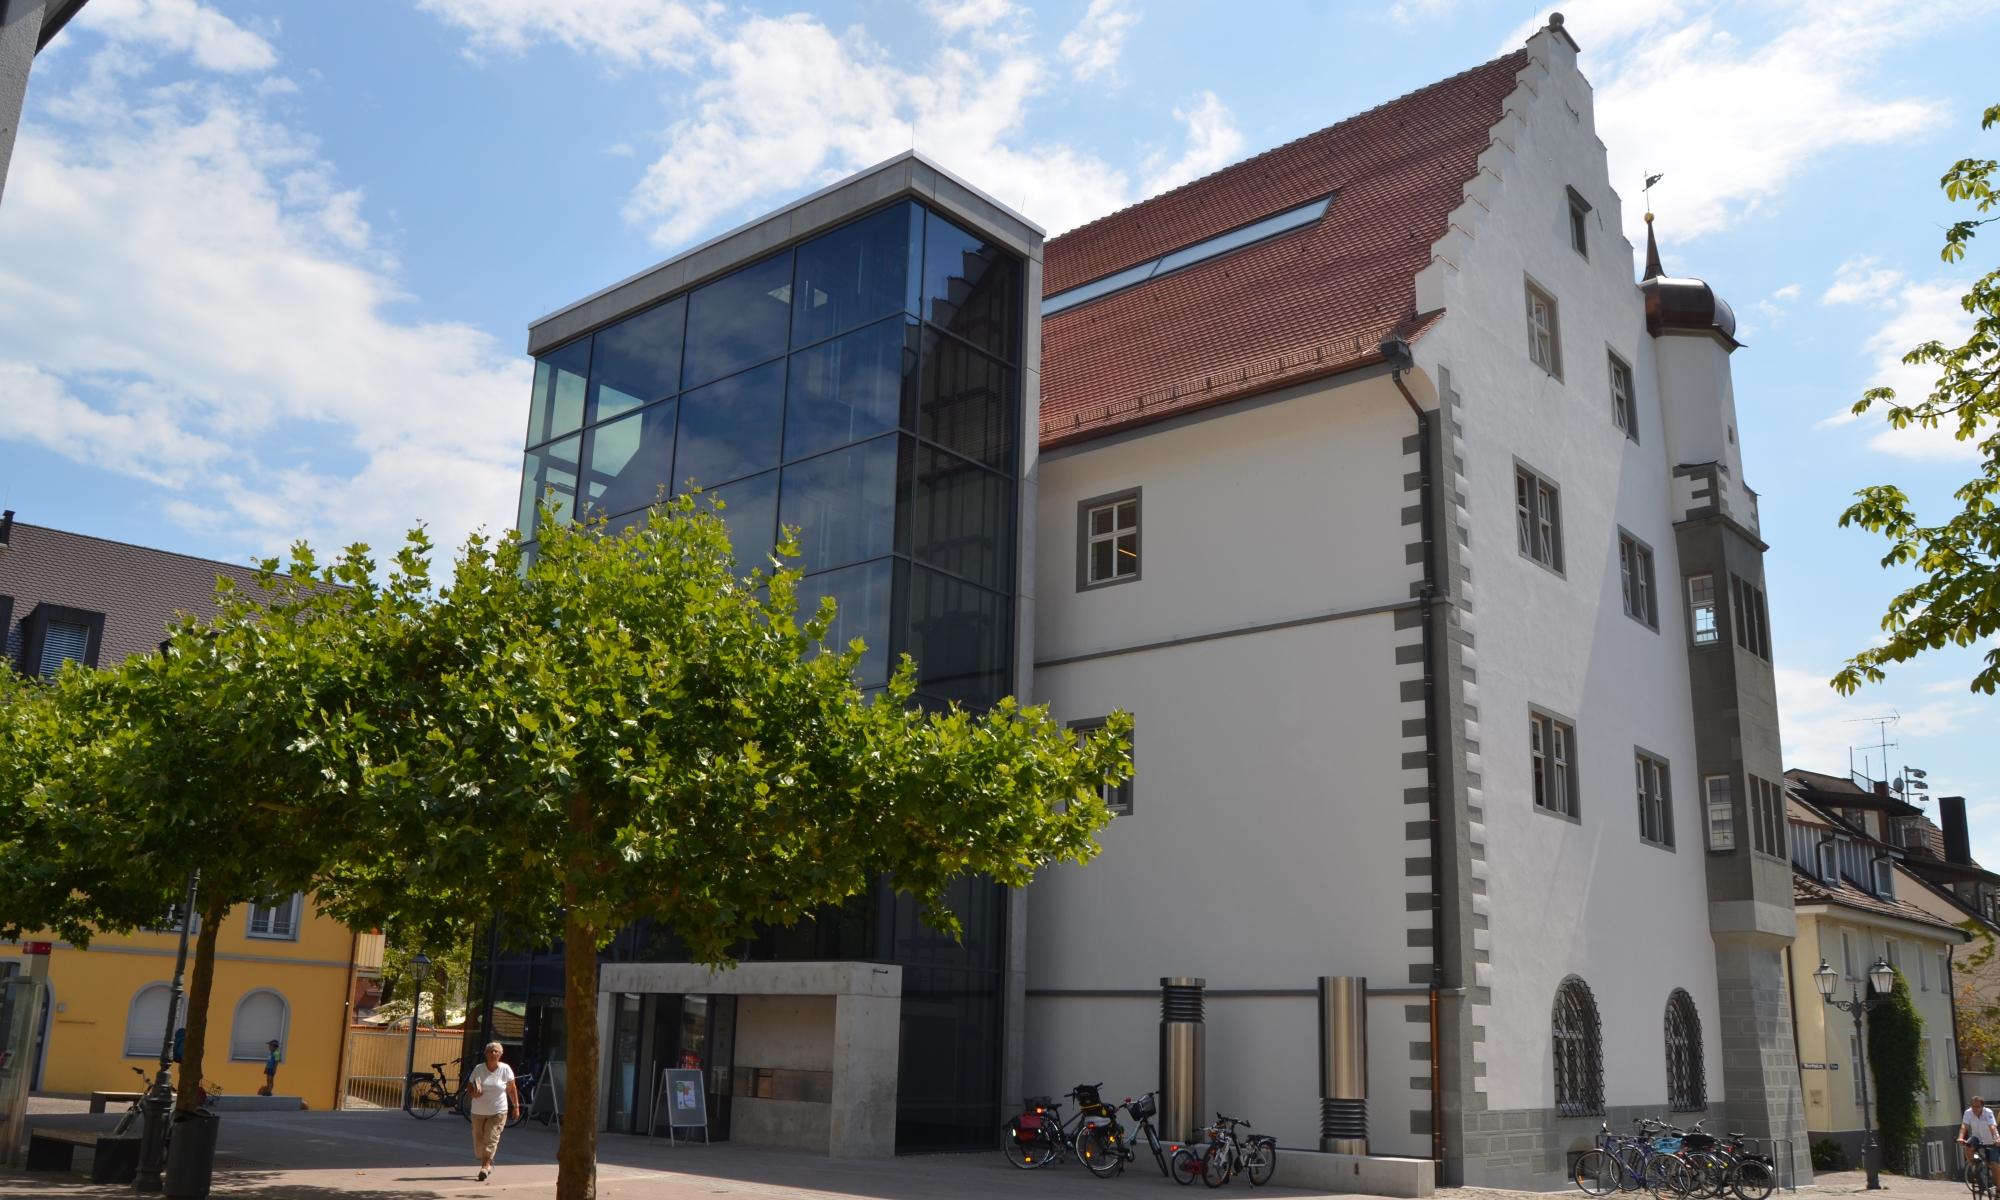 Freundeskreis Stadtbibliothek Radolfzell e.V.